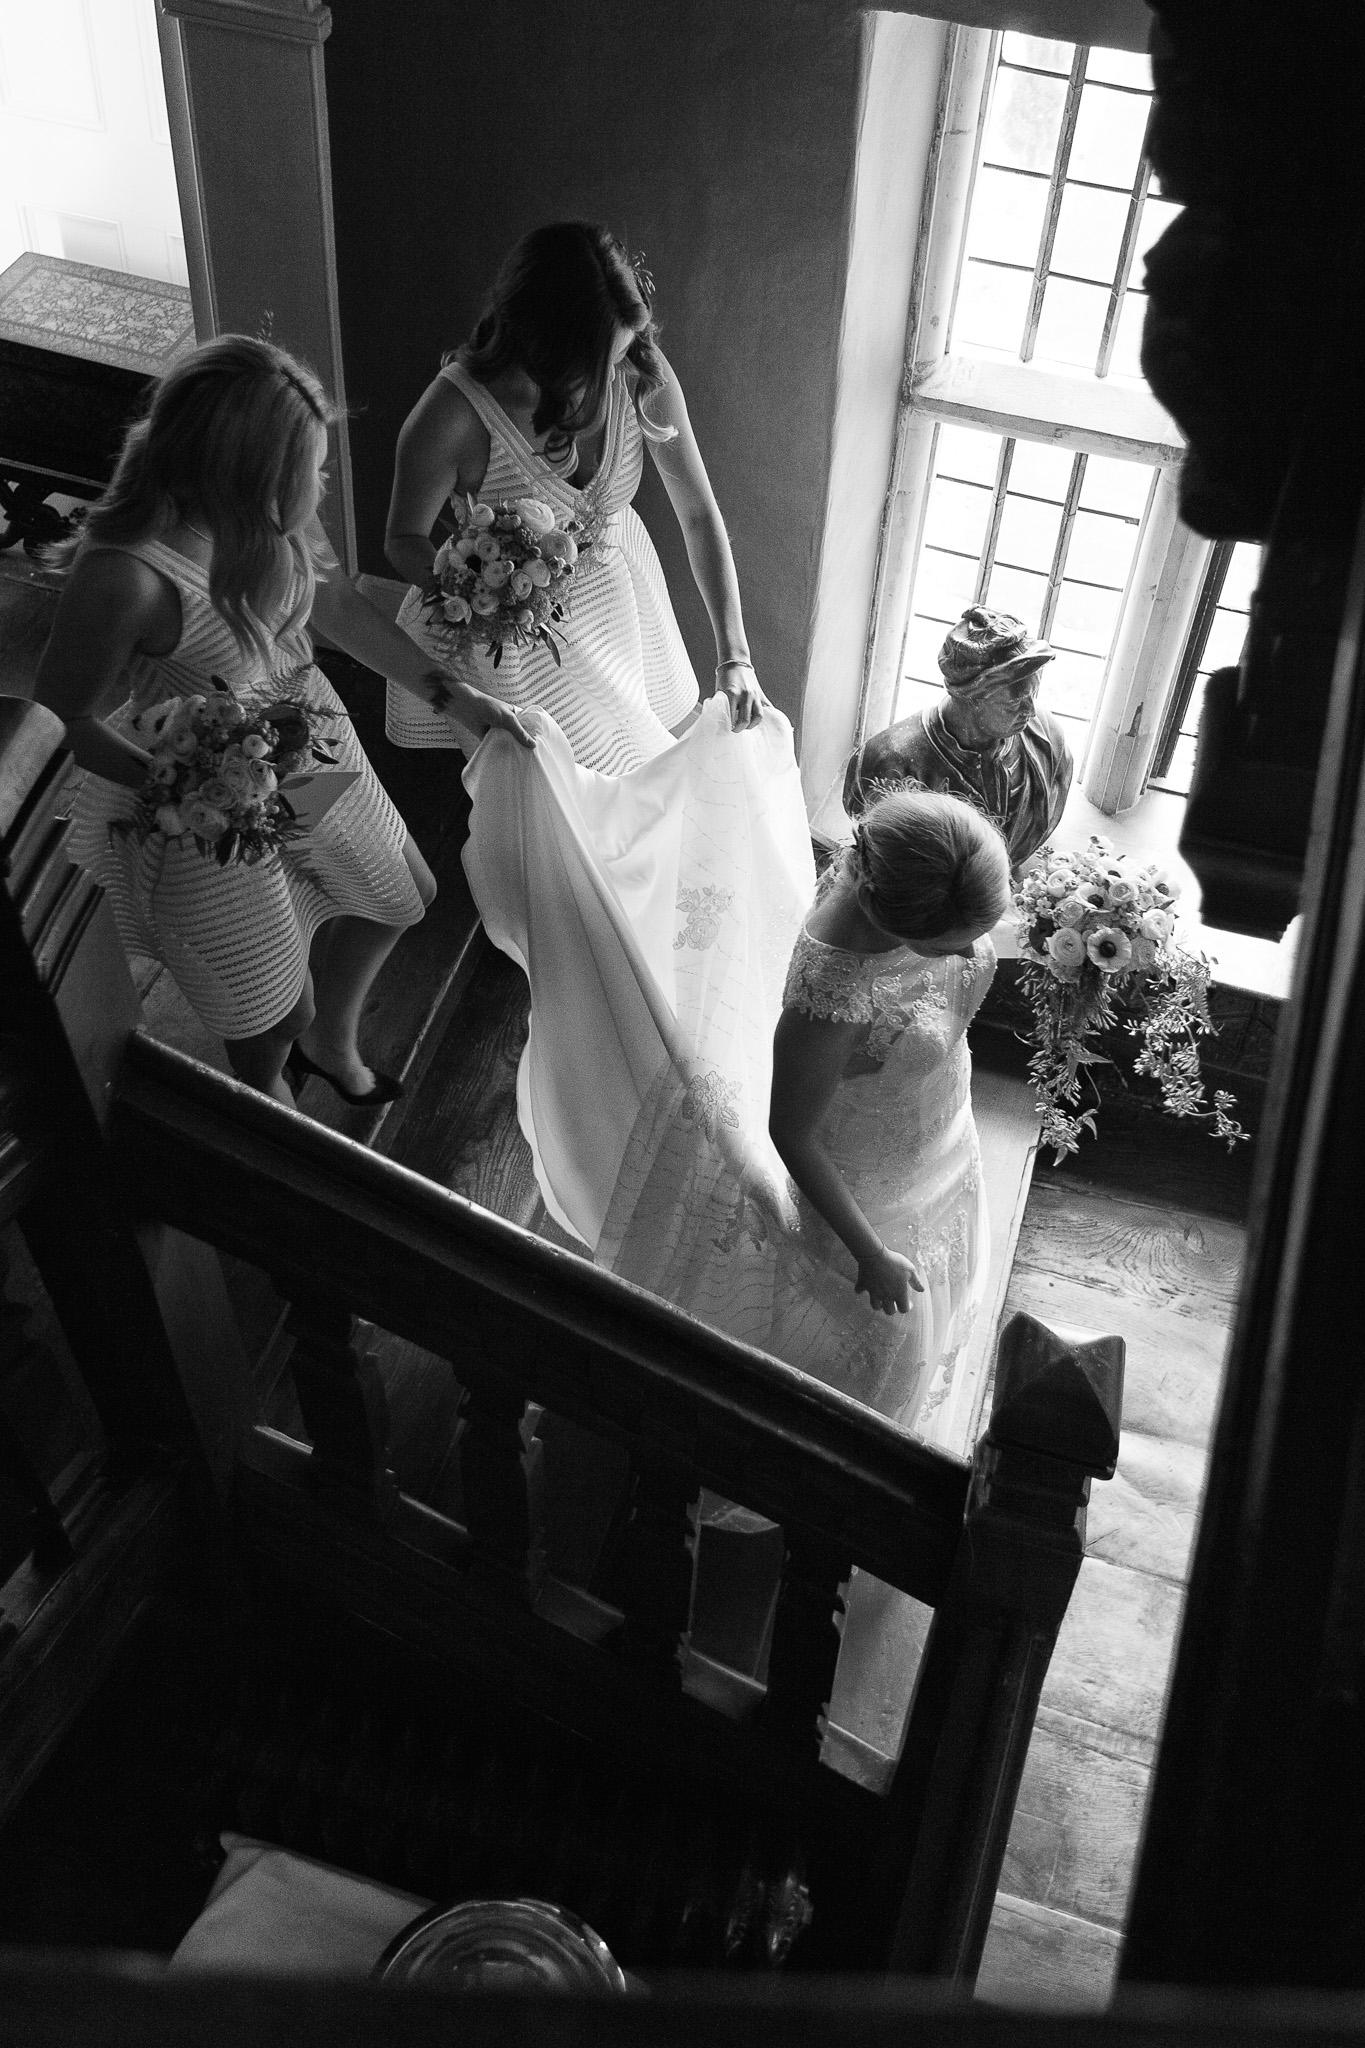 Mark_Barnes_Gloucester_Wedding_Photographer_Elmore_Court_Wedding_Photography_Mike+Kelly-28.jpg